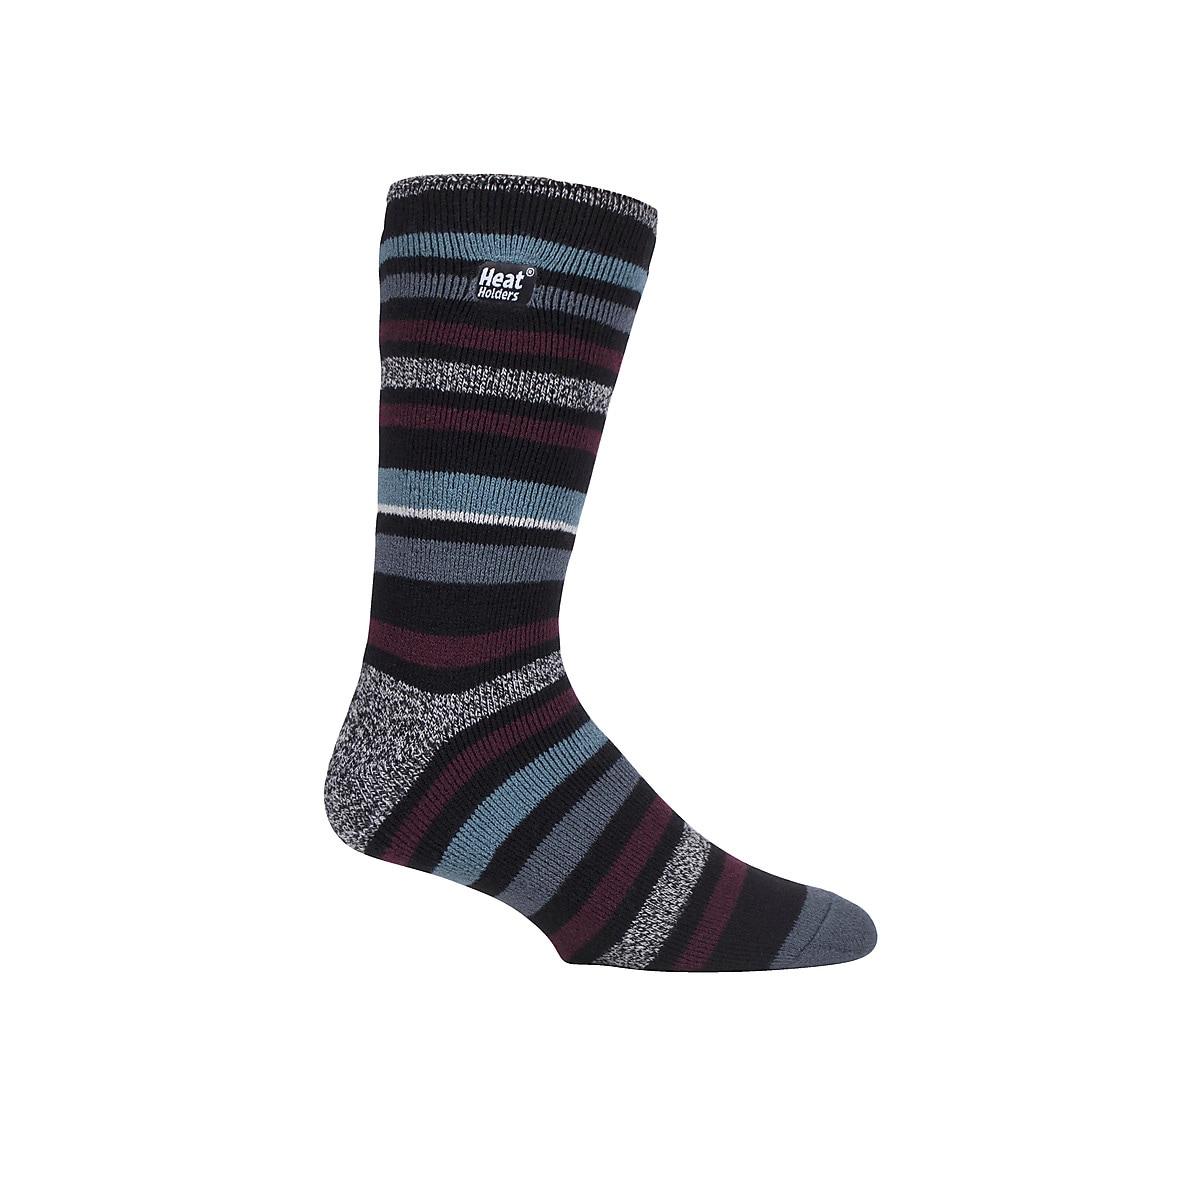 Heat Holders Lite Thermal Socks, size: 39-45